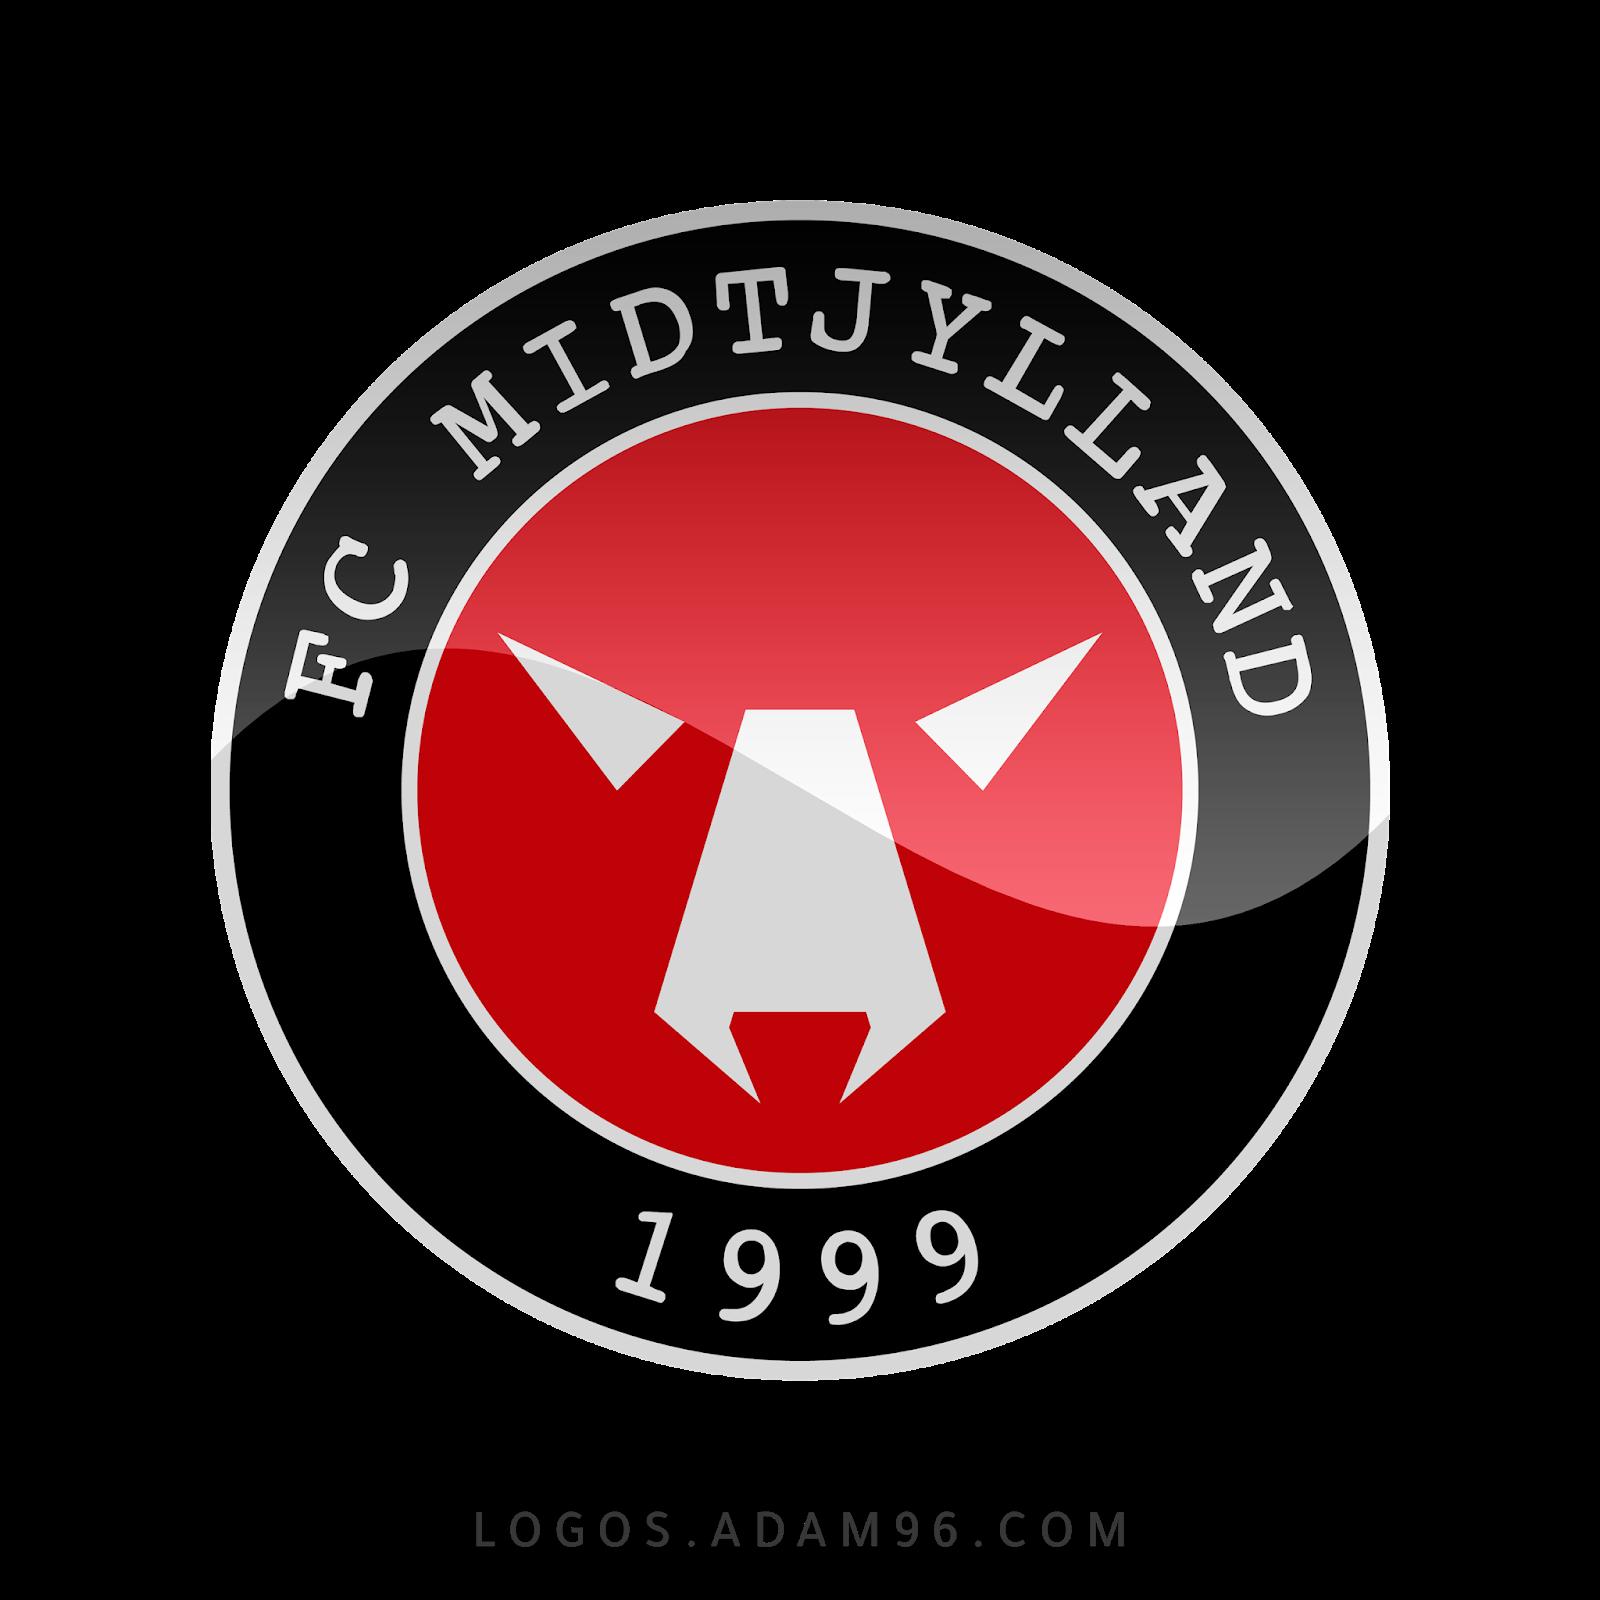 Midtjylland Club